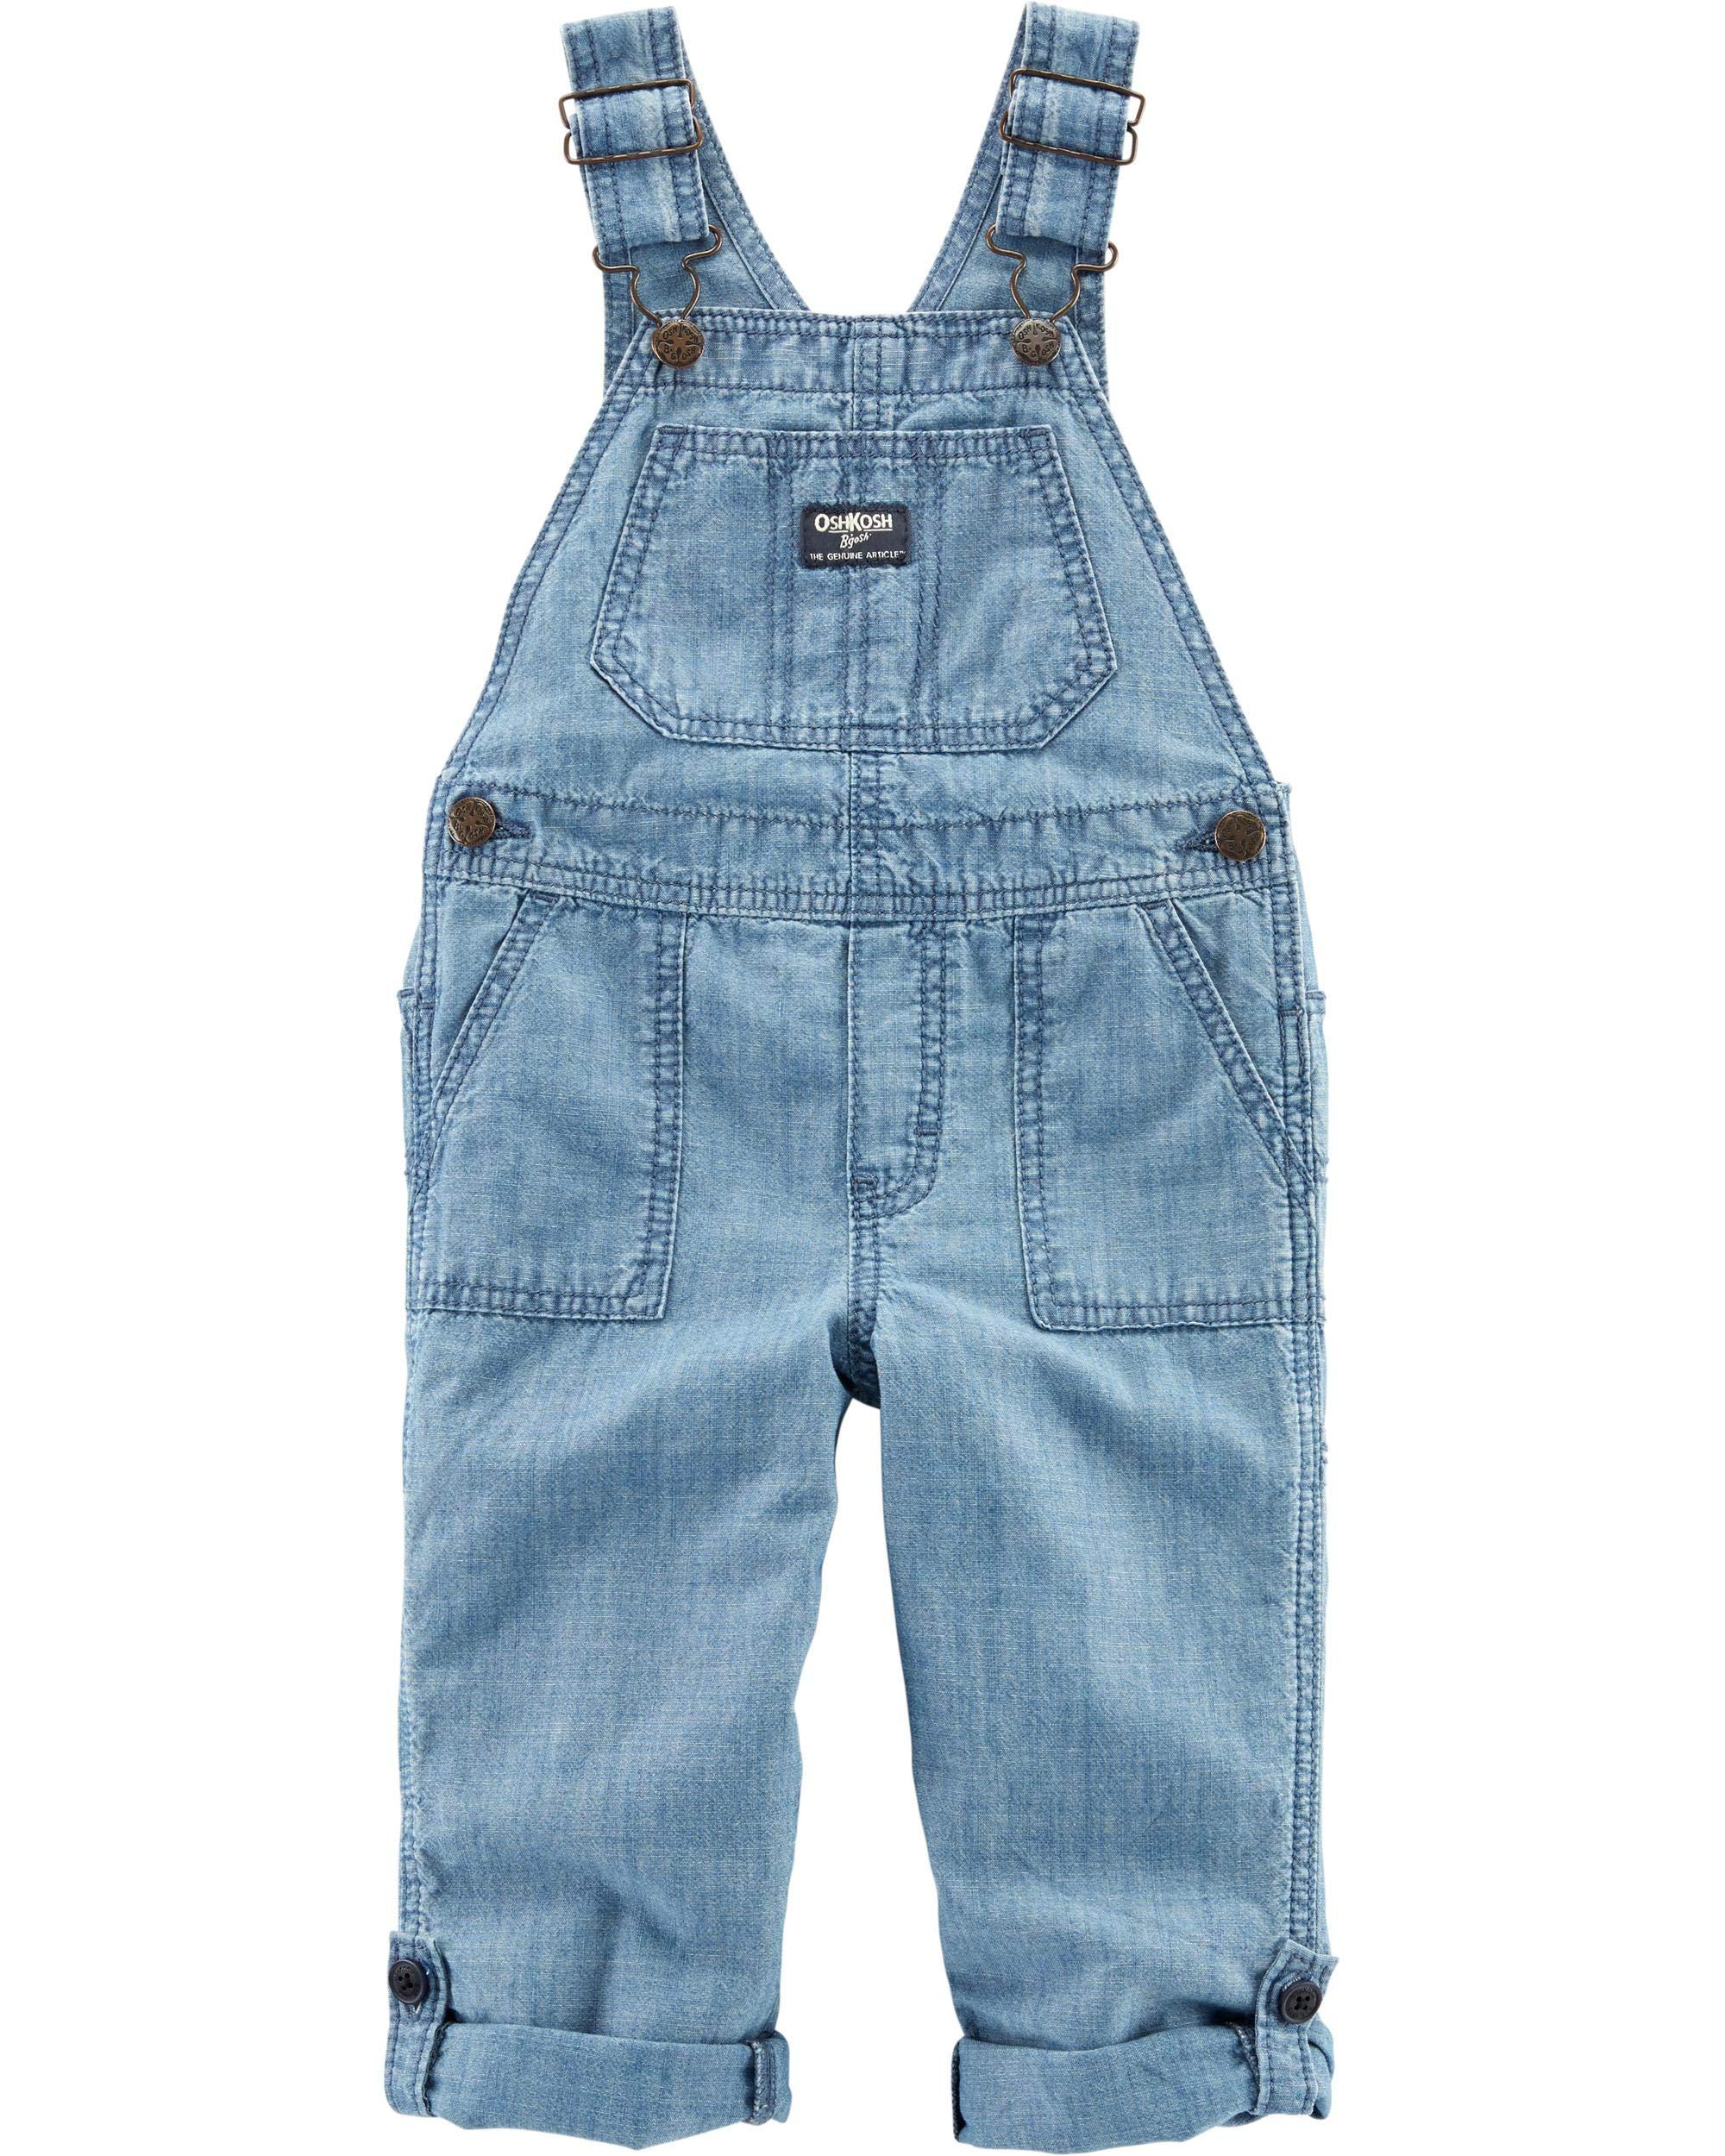 Osh Kosh Boys' Toddler World's Best Overalls, Hibiscus wash 2T